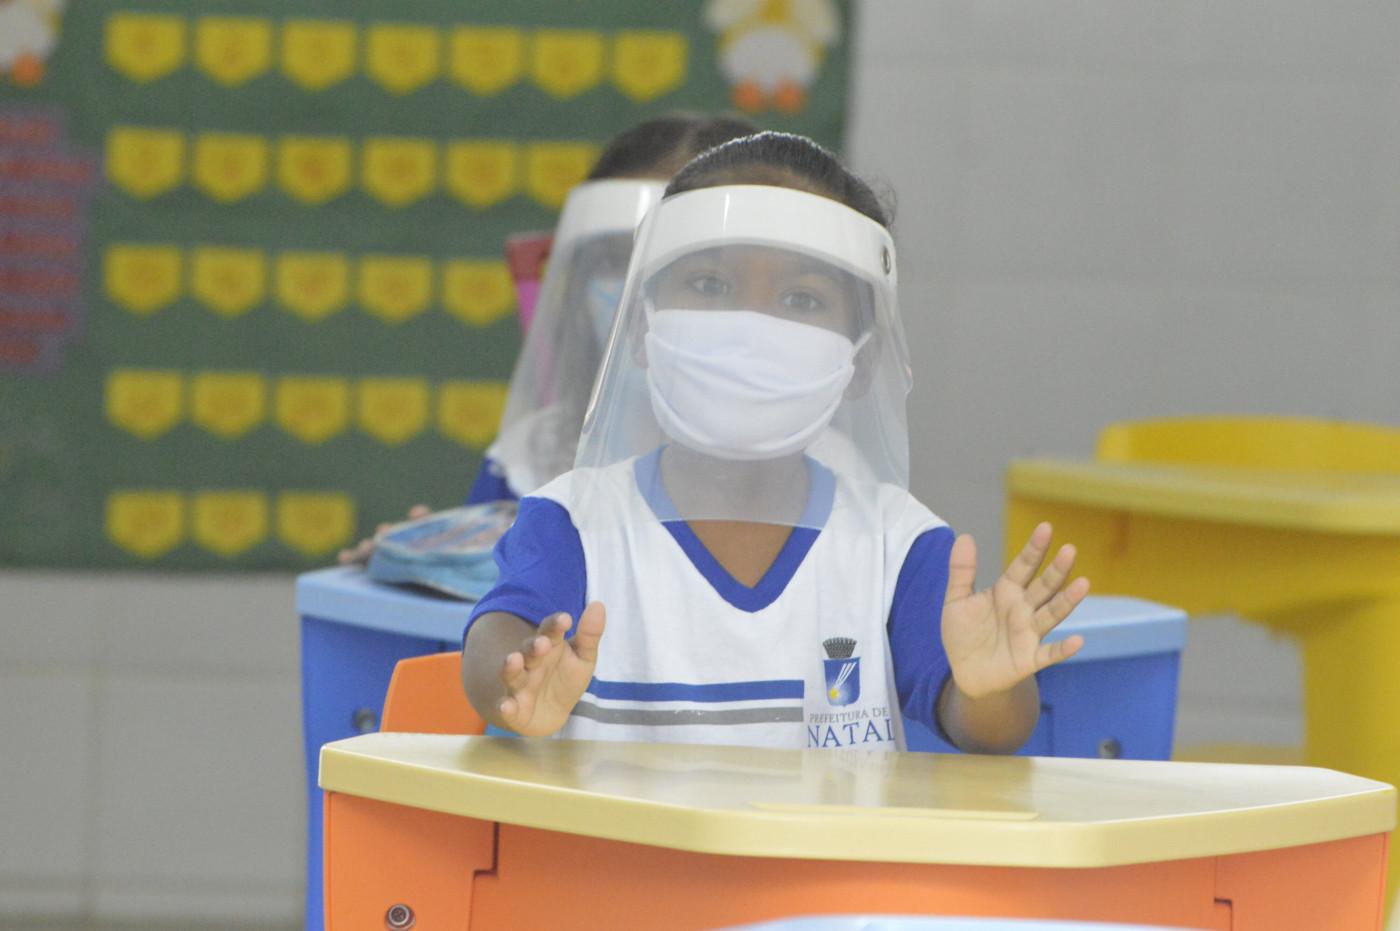 Aluna usa máscara de proteção e face shield dentro de sala de aula